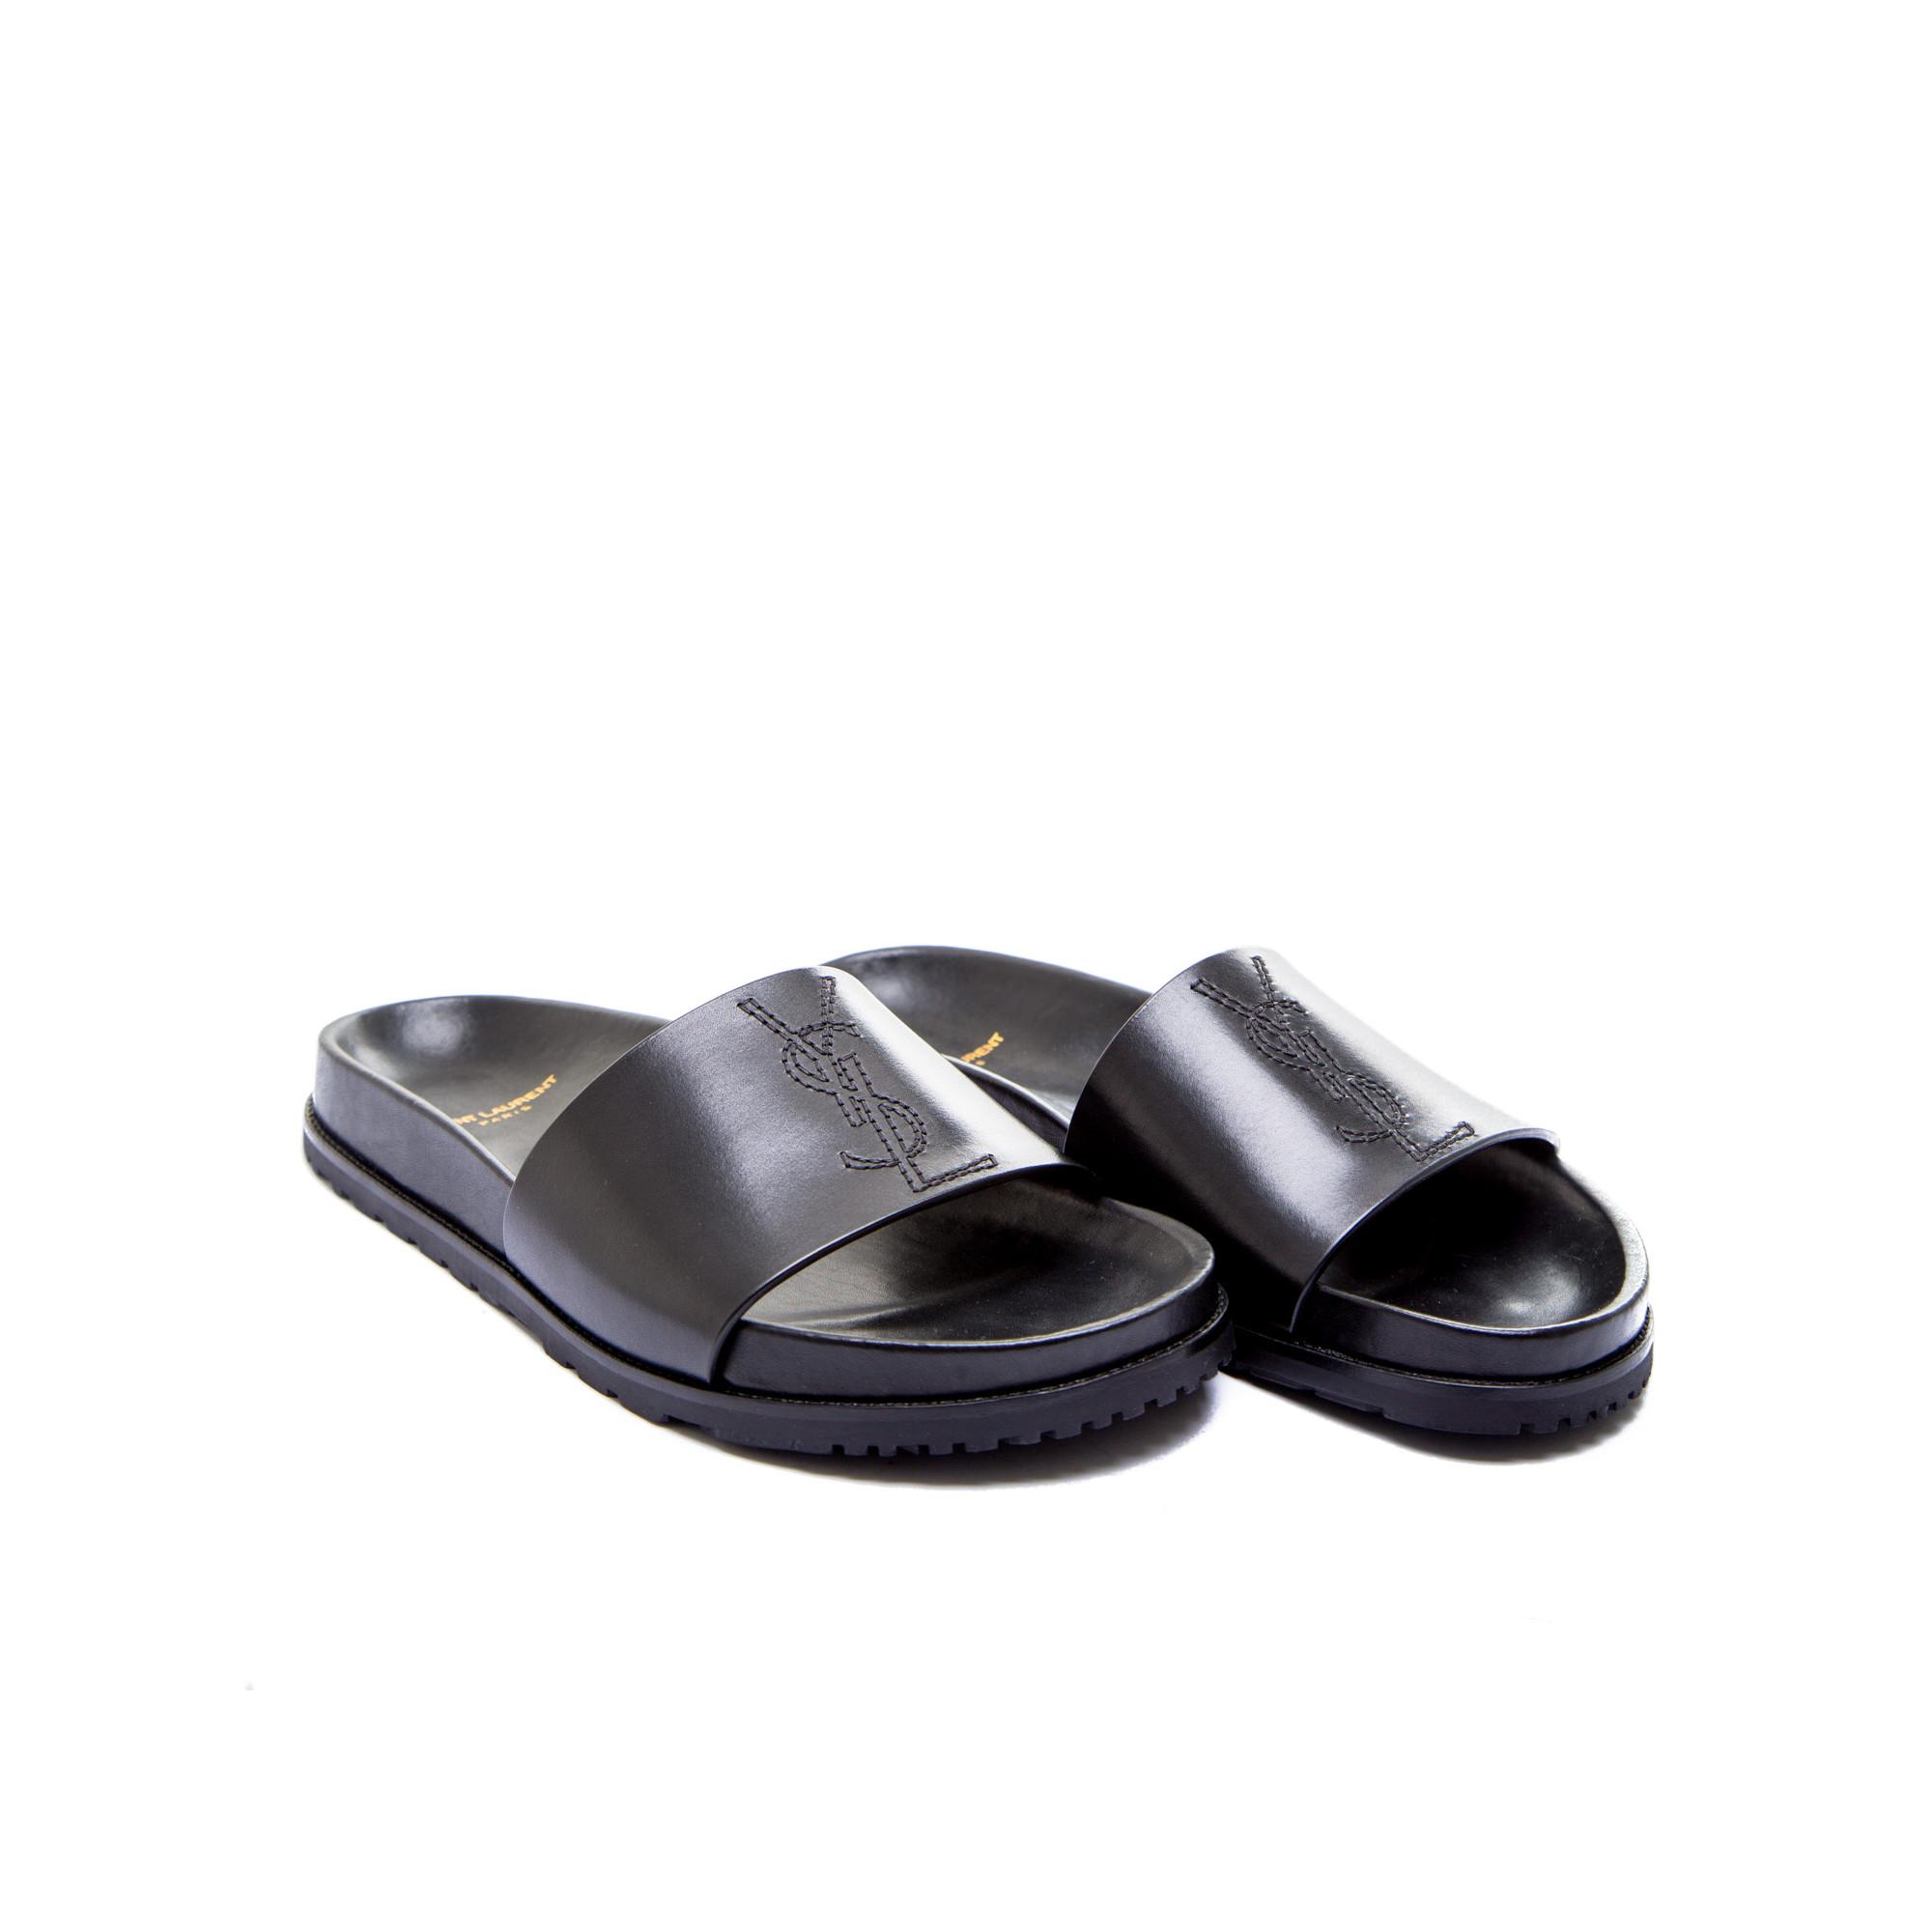 Cheap Sale Affordable 2018 New Jimmy 20 Sandal Saint Laurent Best Sale Sale Online Outlet Online Fashionable VB81YCud